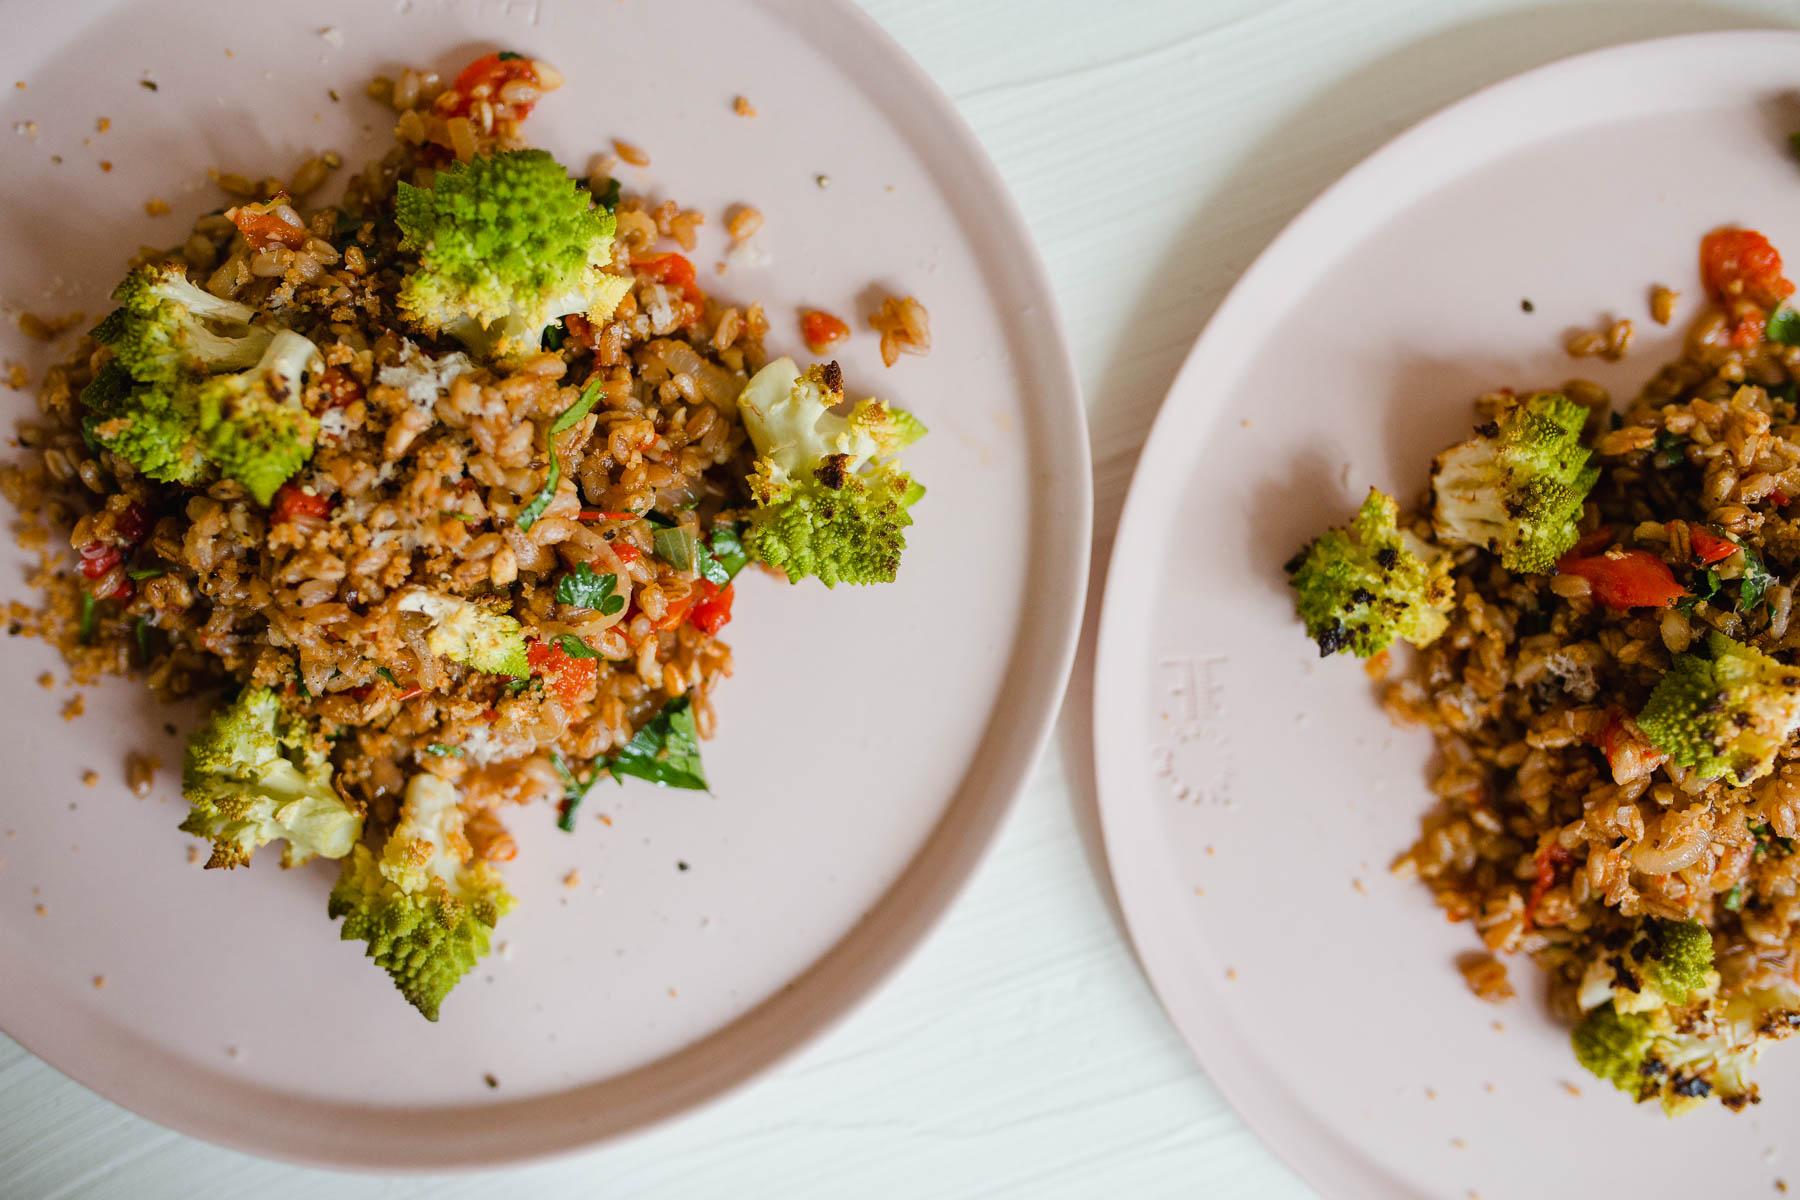 chicago-nyc-food-lifestyle-photographer-15.jpg